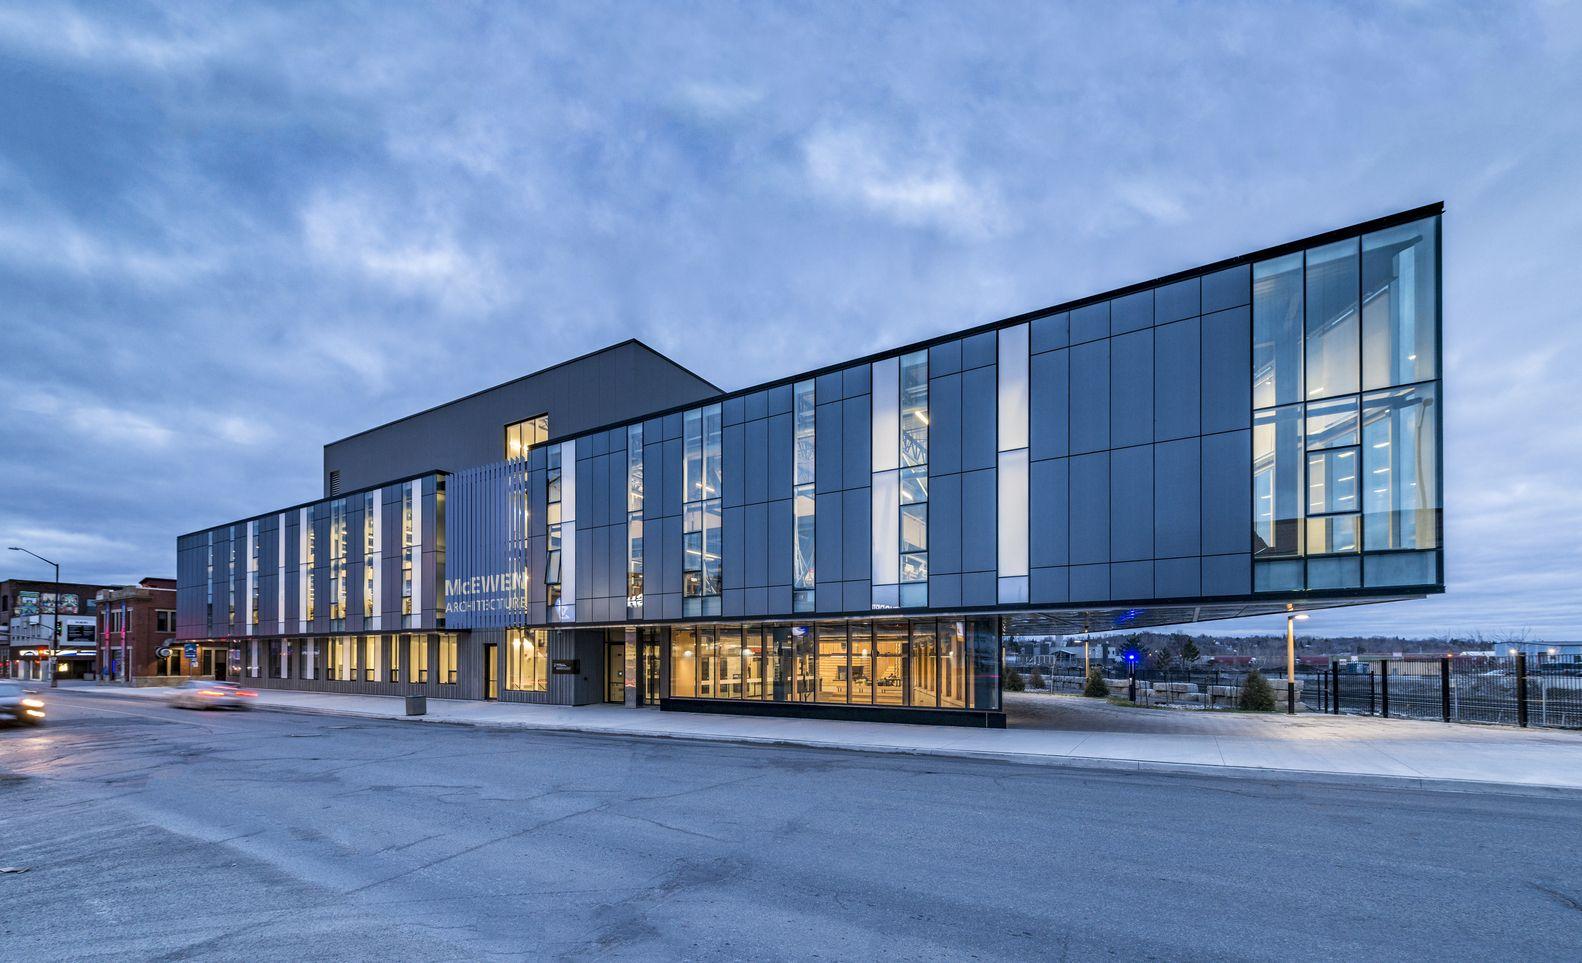 Gallery Of Mcewen School Of Architecture Lga Architectural Partners 9 School Architecture Architectural Practice Architecture